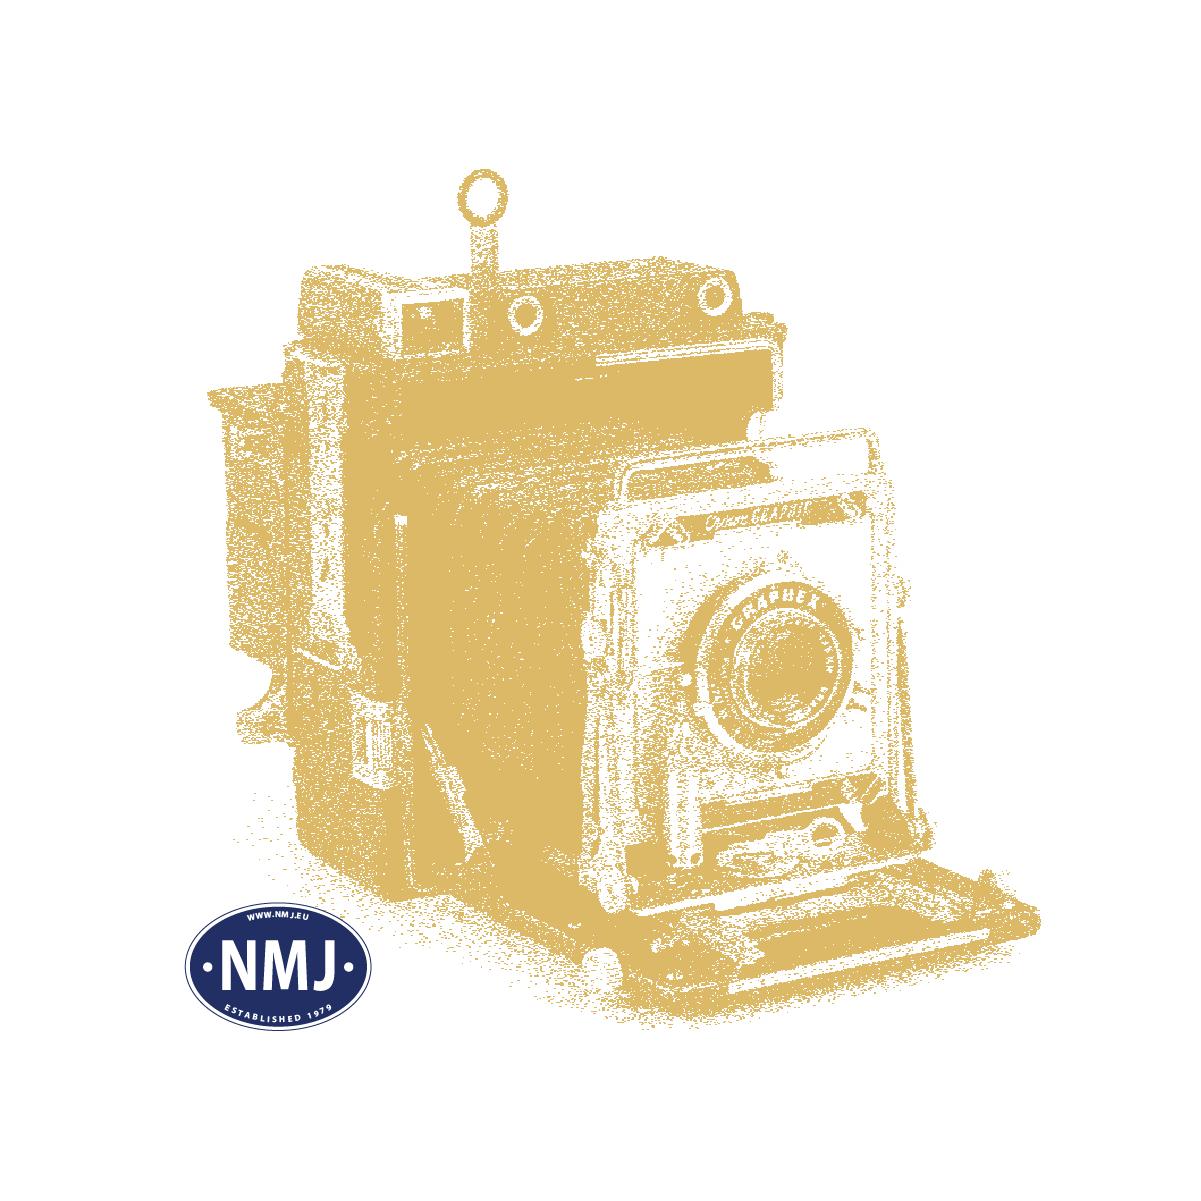 NMJT245002 - NMJ Topline NSB Di3.622 Rotbraun, Spur 0, DCC m/Sound